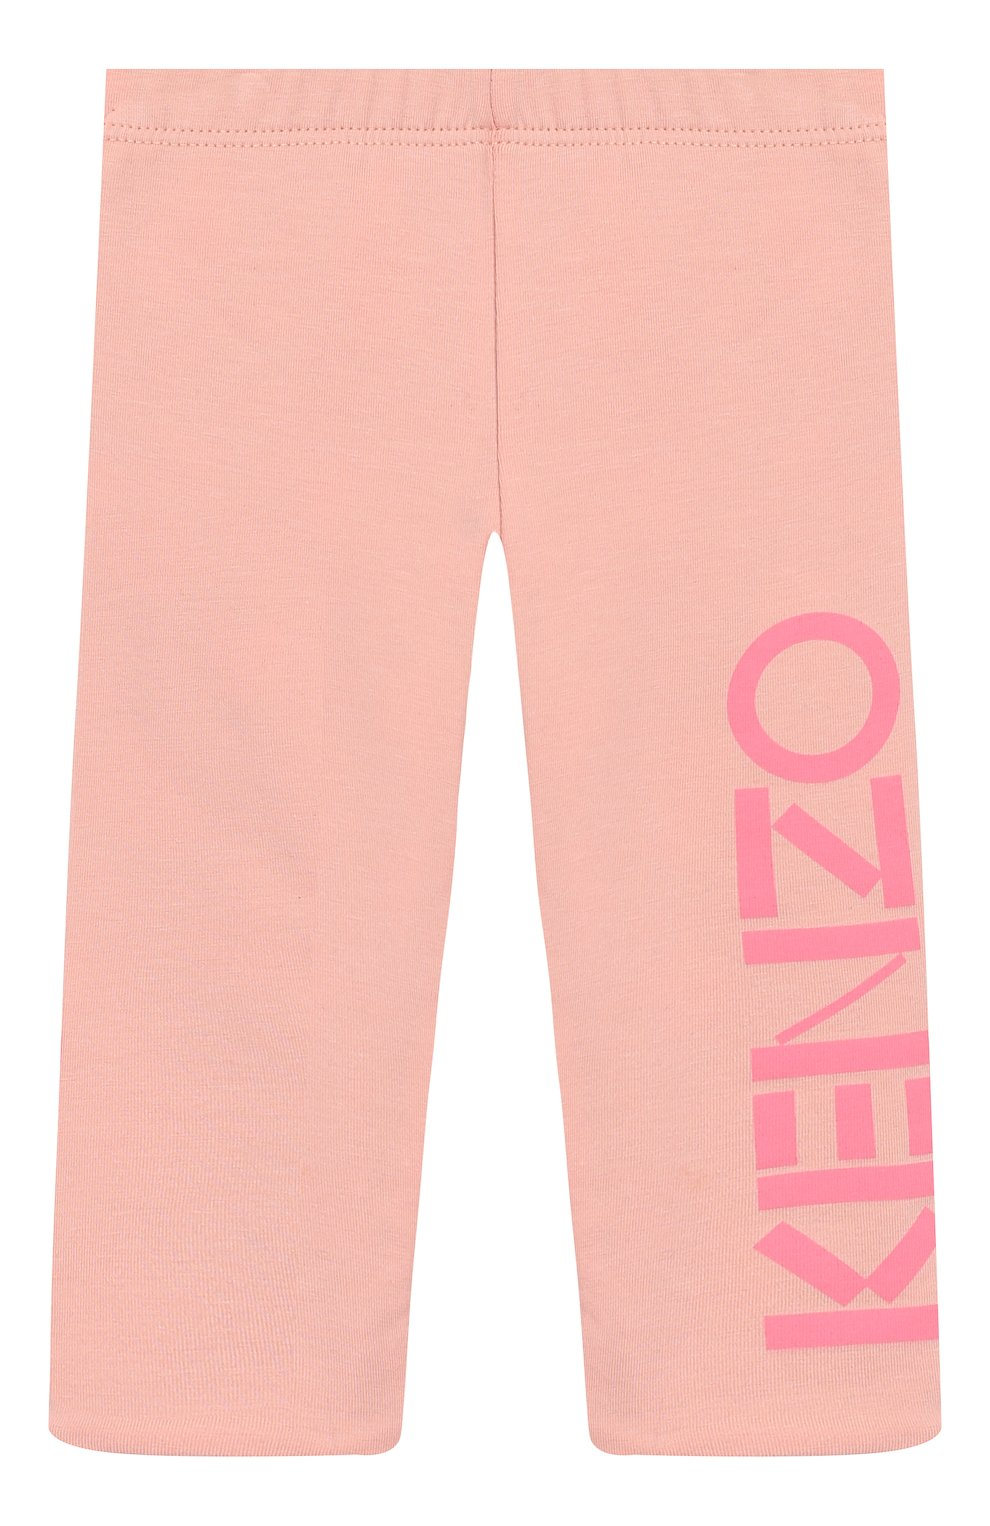 Детские двусторонние леггинсы KENZO розового цвета, арт. KP24017 | Фото 1